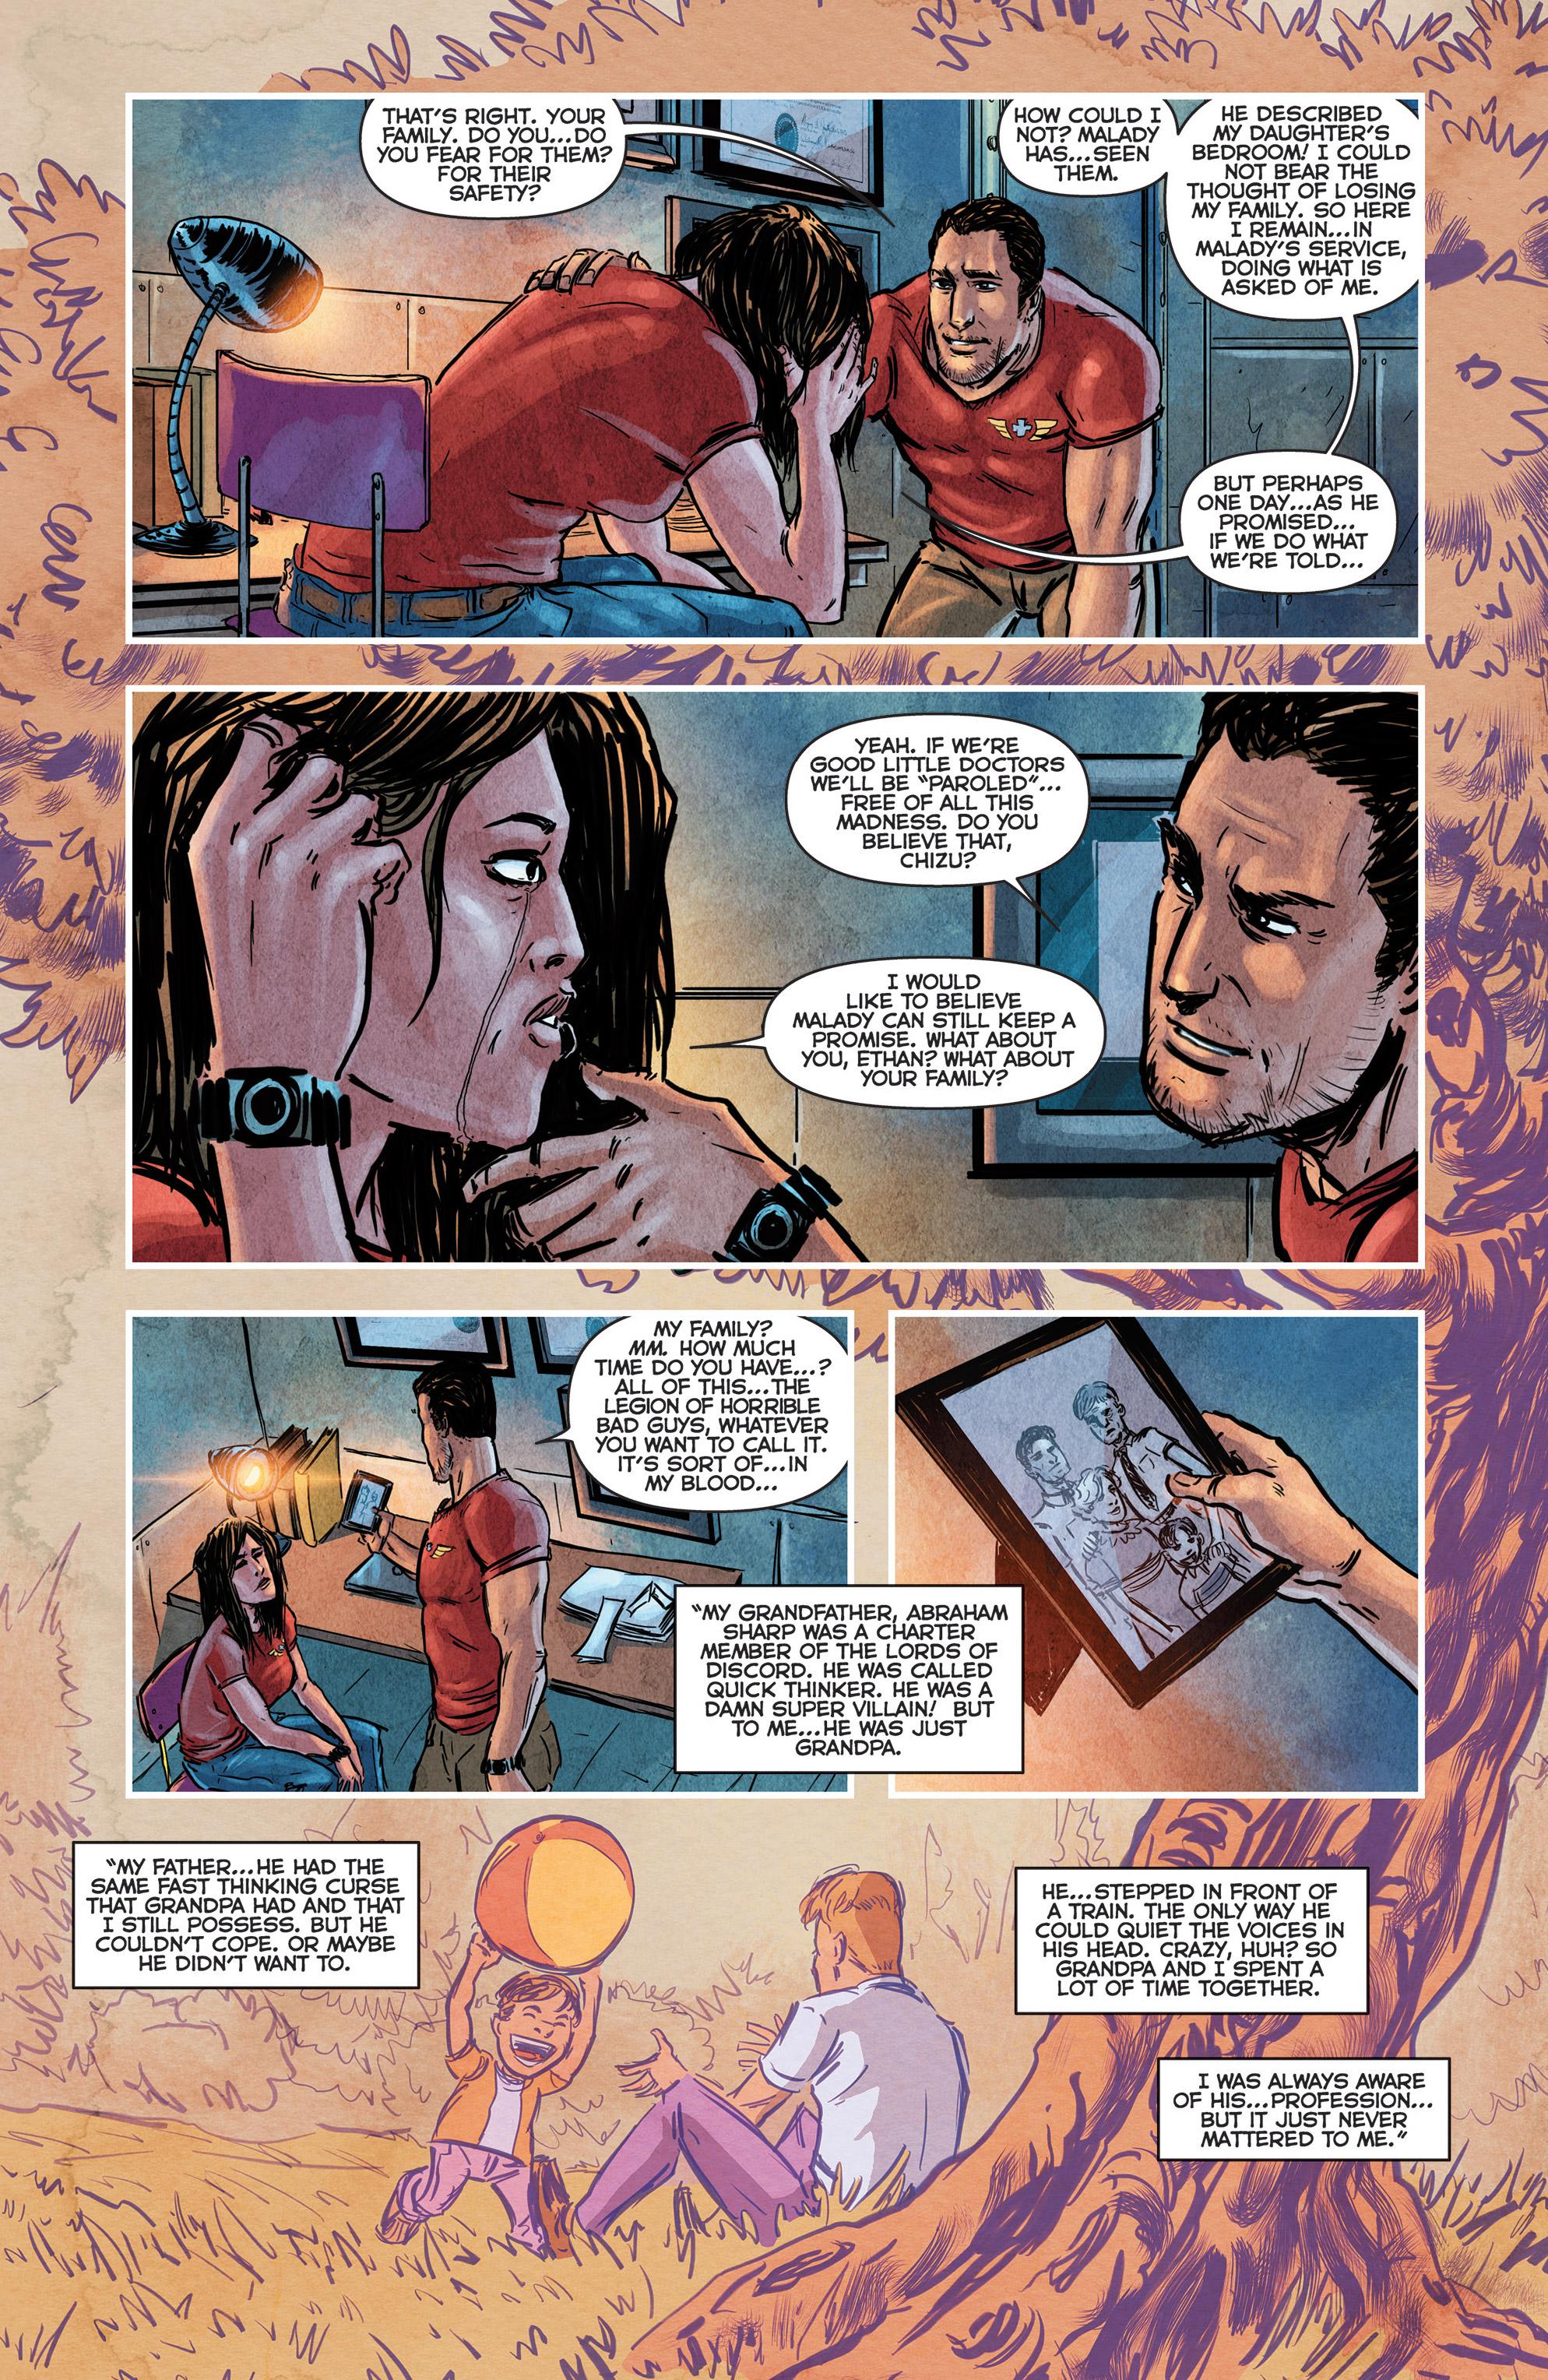 Read online Medisin comic -  Issue #1 - 17